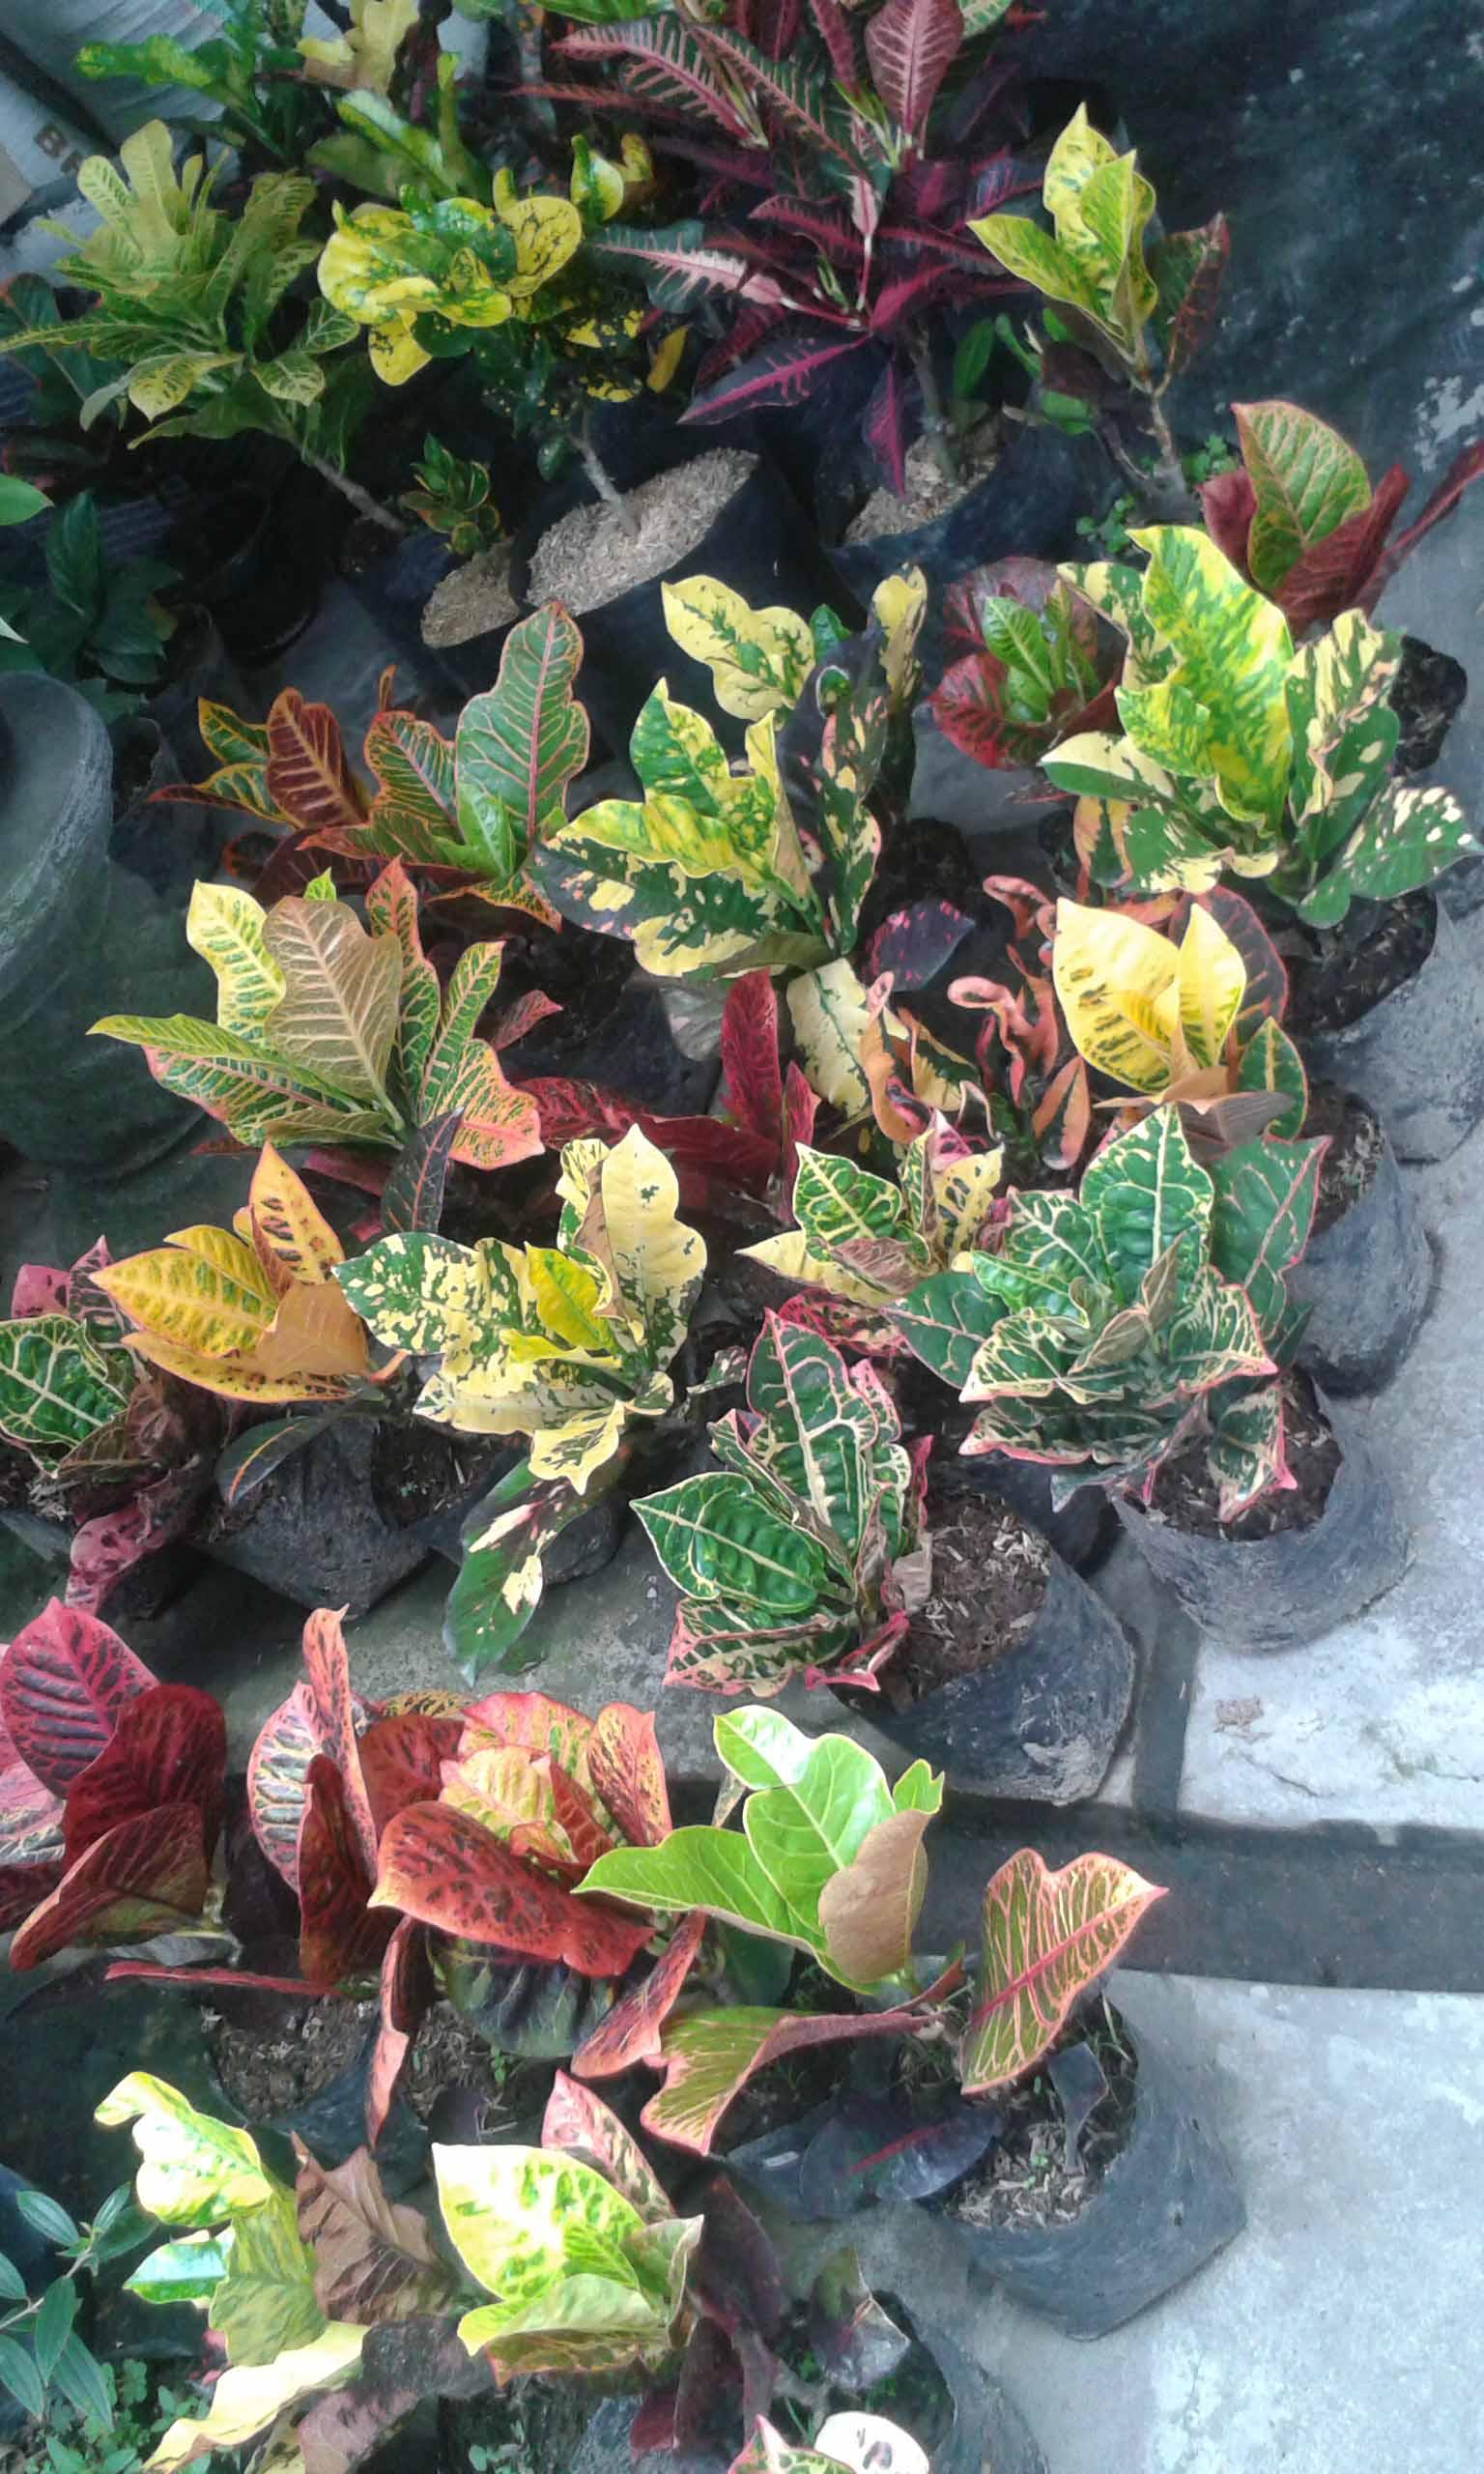 jenis tanaman puring dan harganya